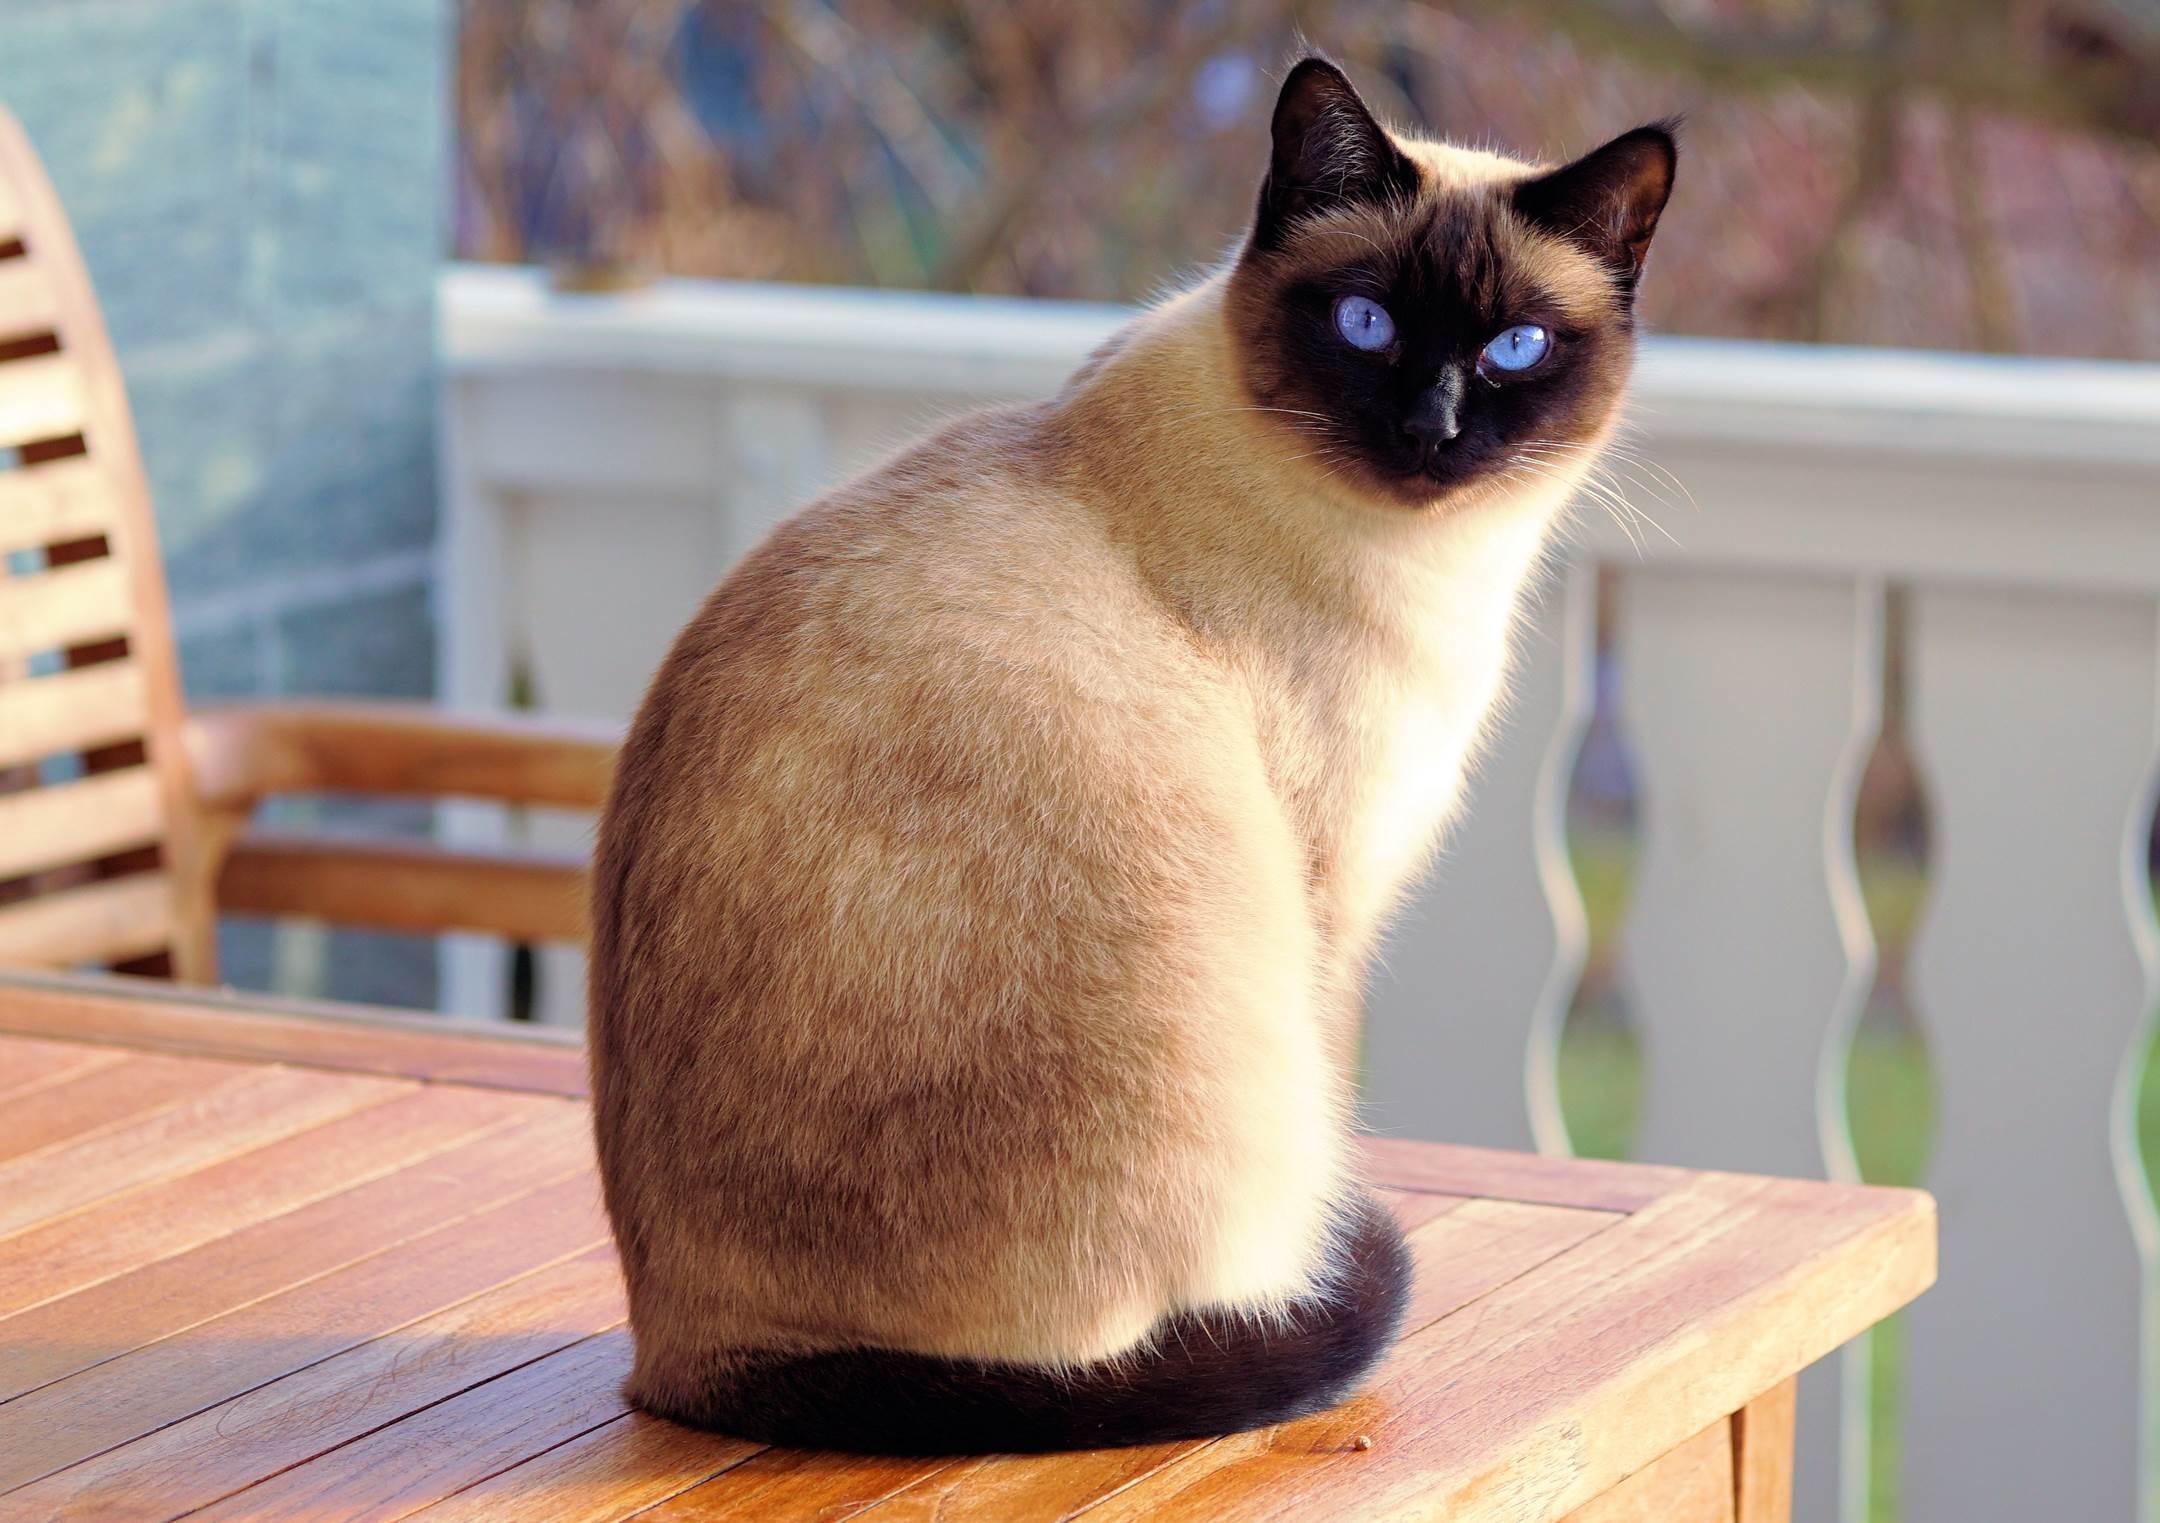 230 Nama Kucing Jantan Paling Bagus Lucu Dan Unik Kerja Usaha